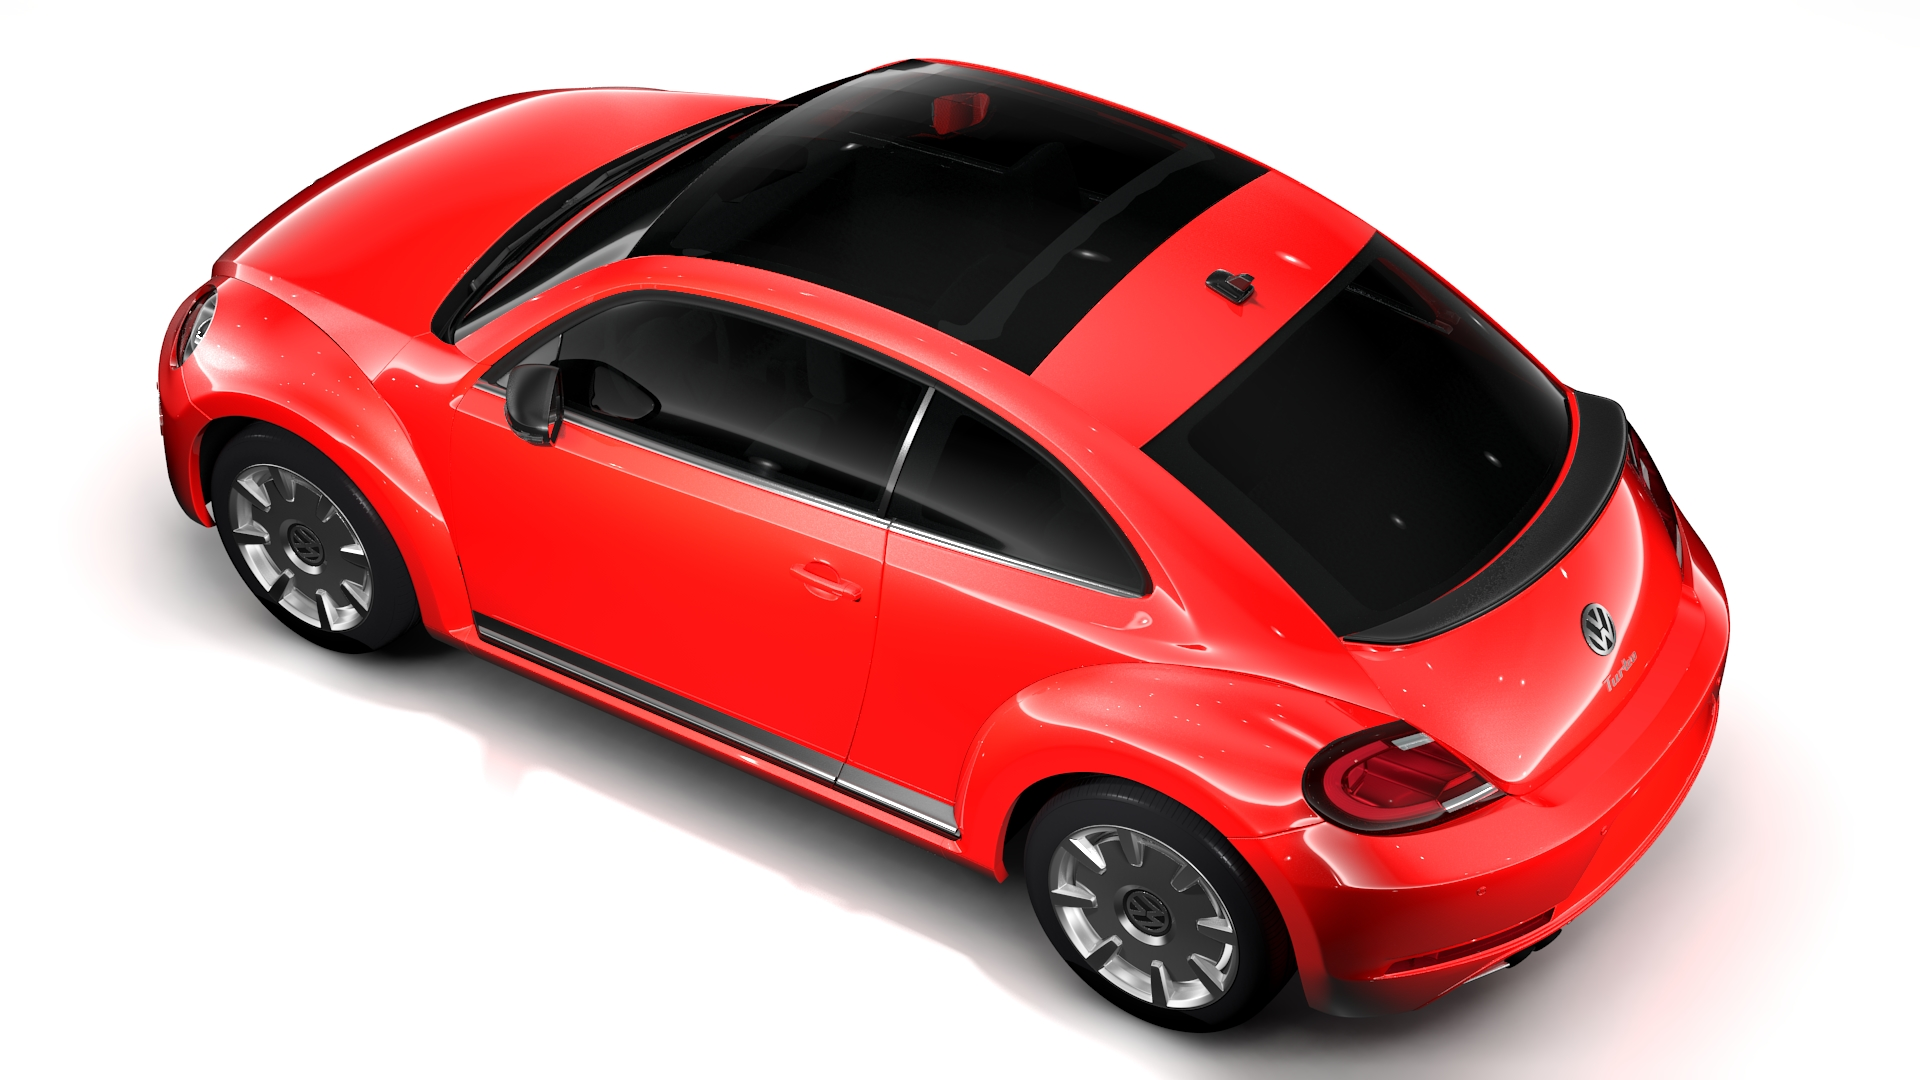 vw beetle turbo 2017 3d model 3ds max fbx c4d lwo ma mb hrc xsi obj 221668